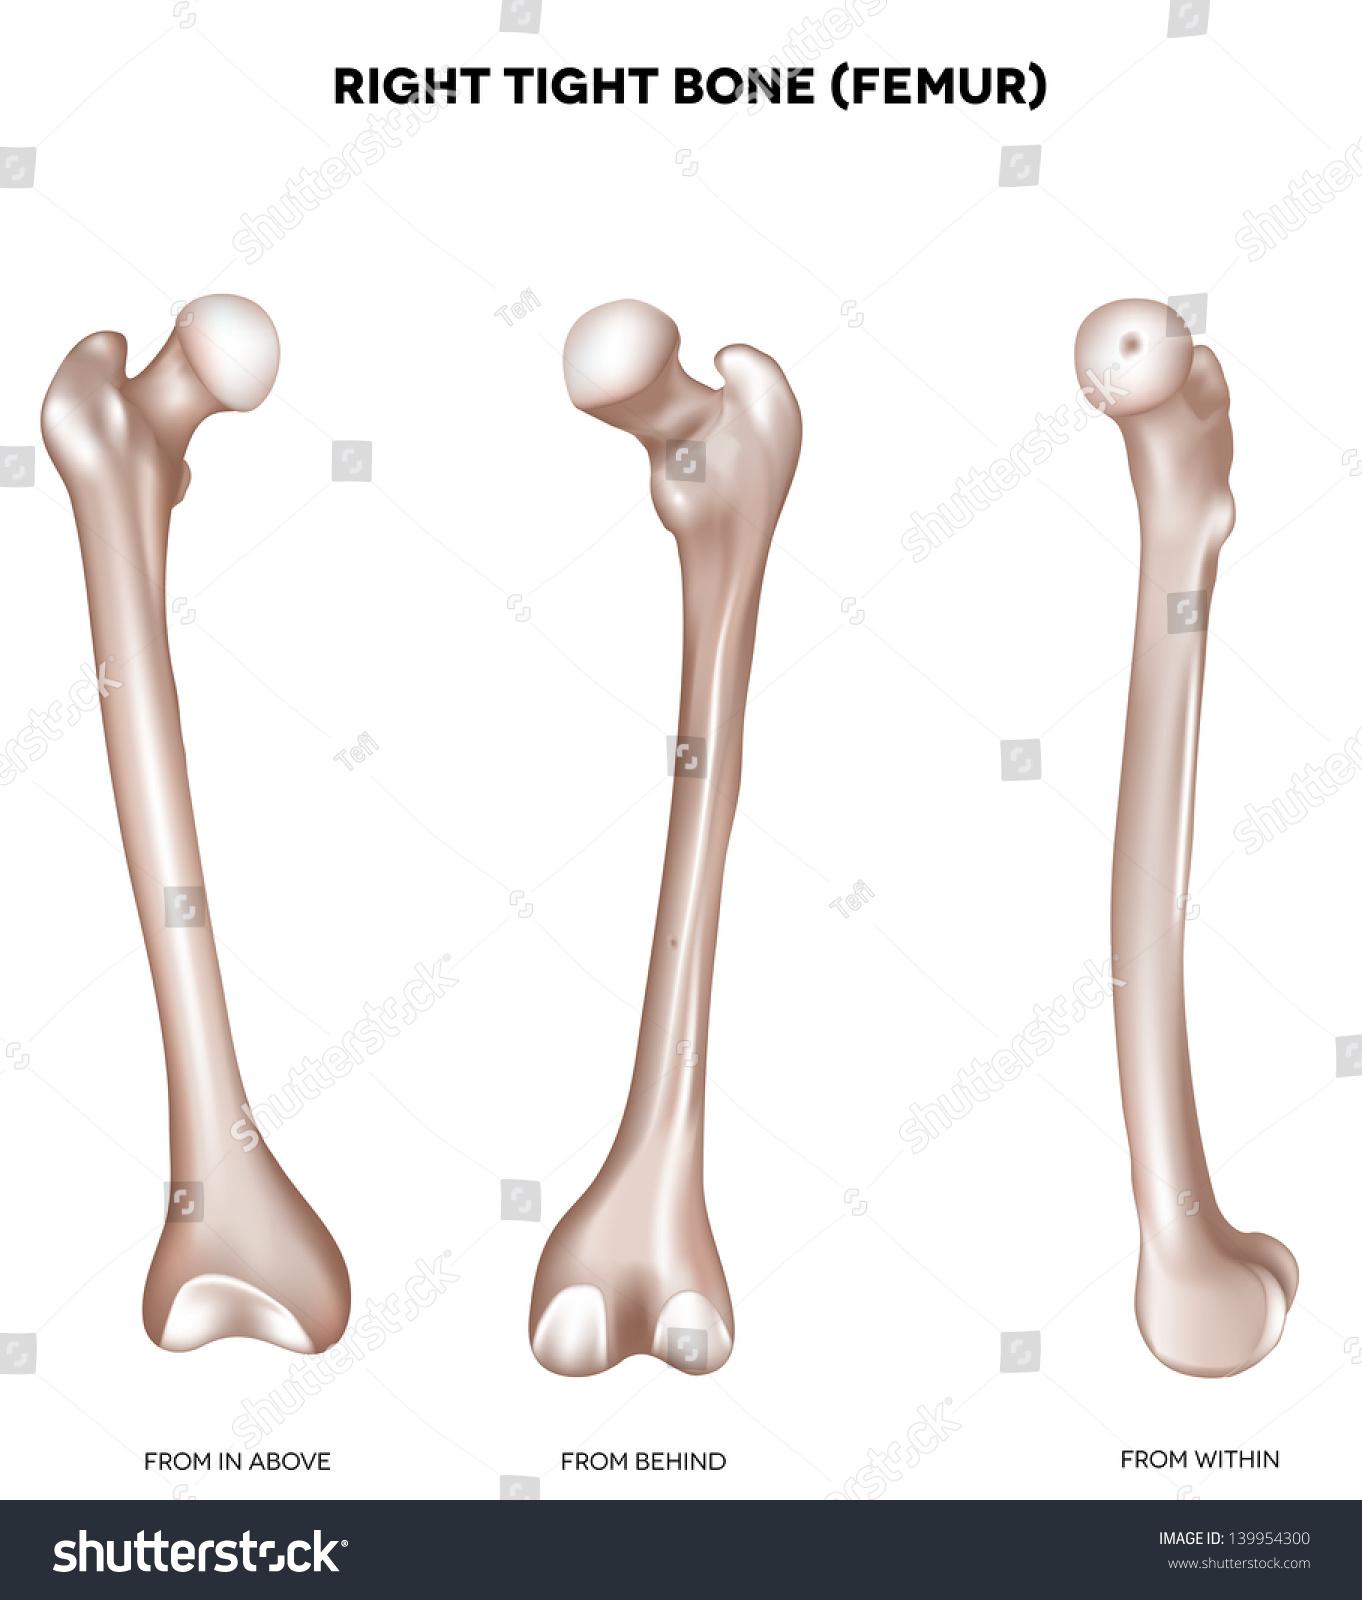 Right Tight Bone Femur Bone Lower Stock Vector Royalty Free